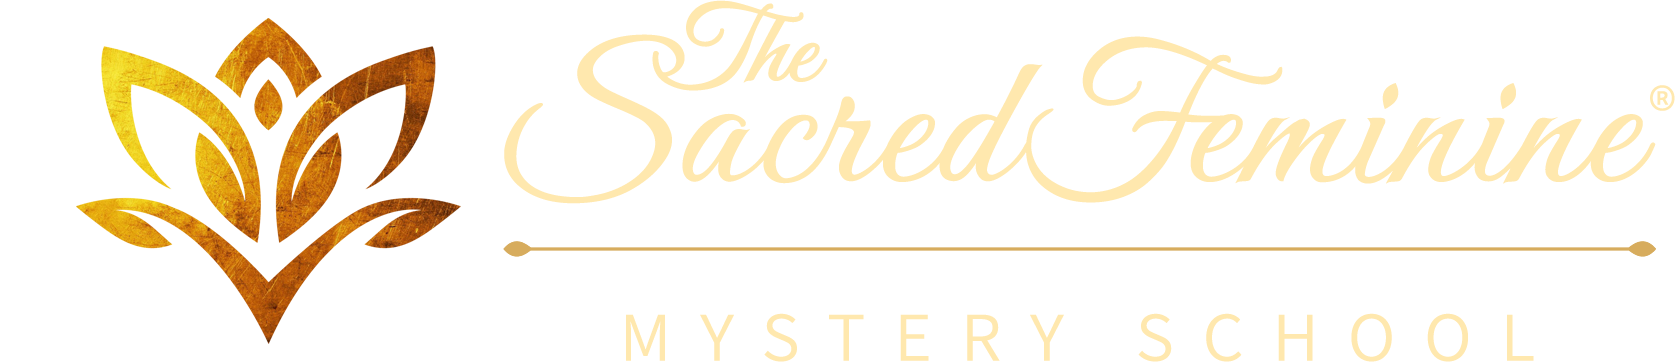 The Sacred Feminine Mystery School Logo